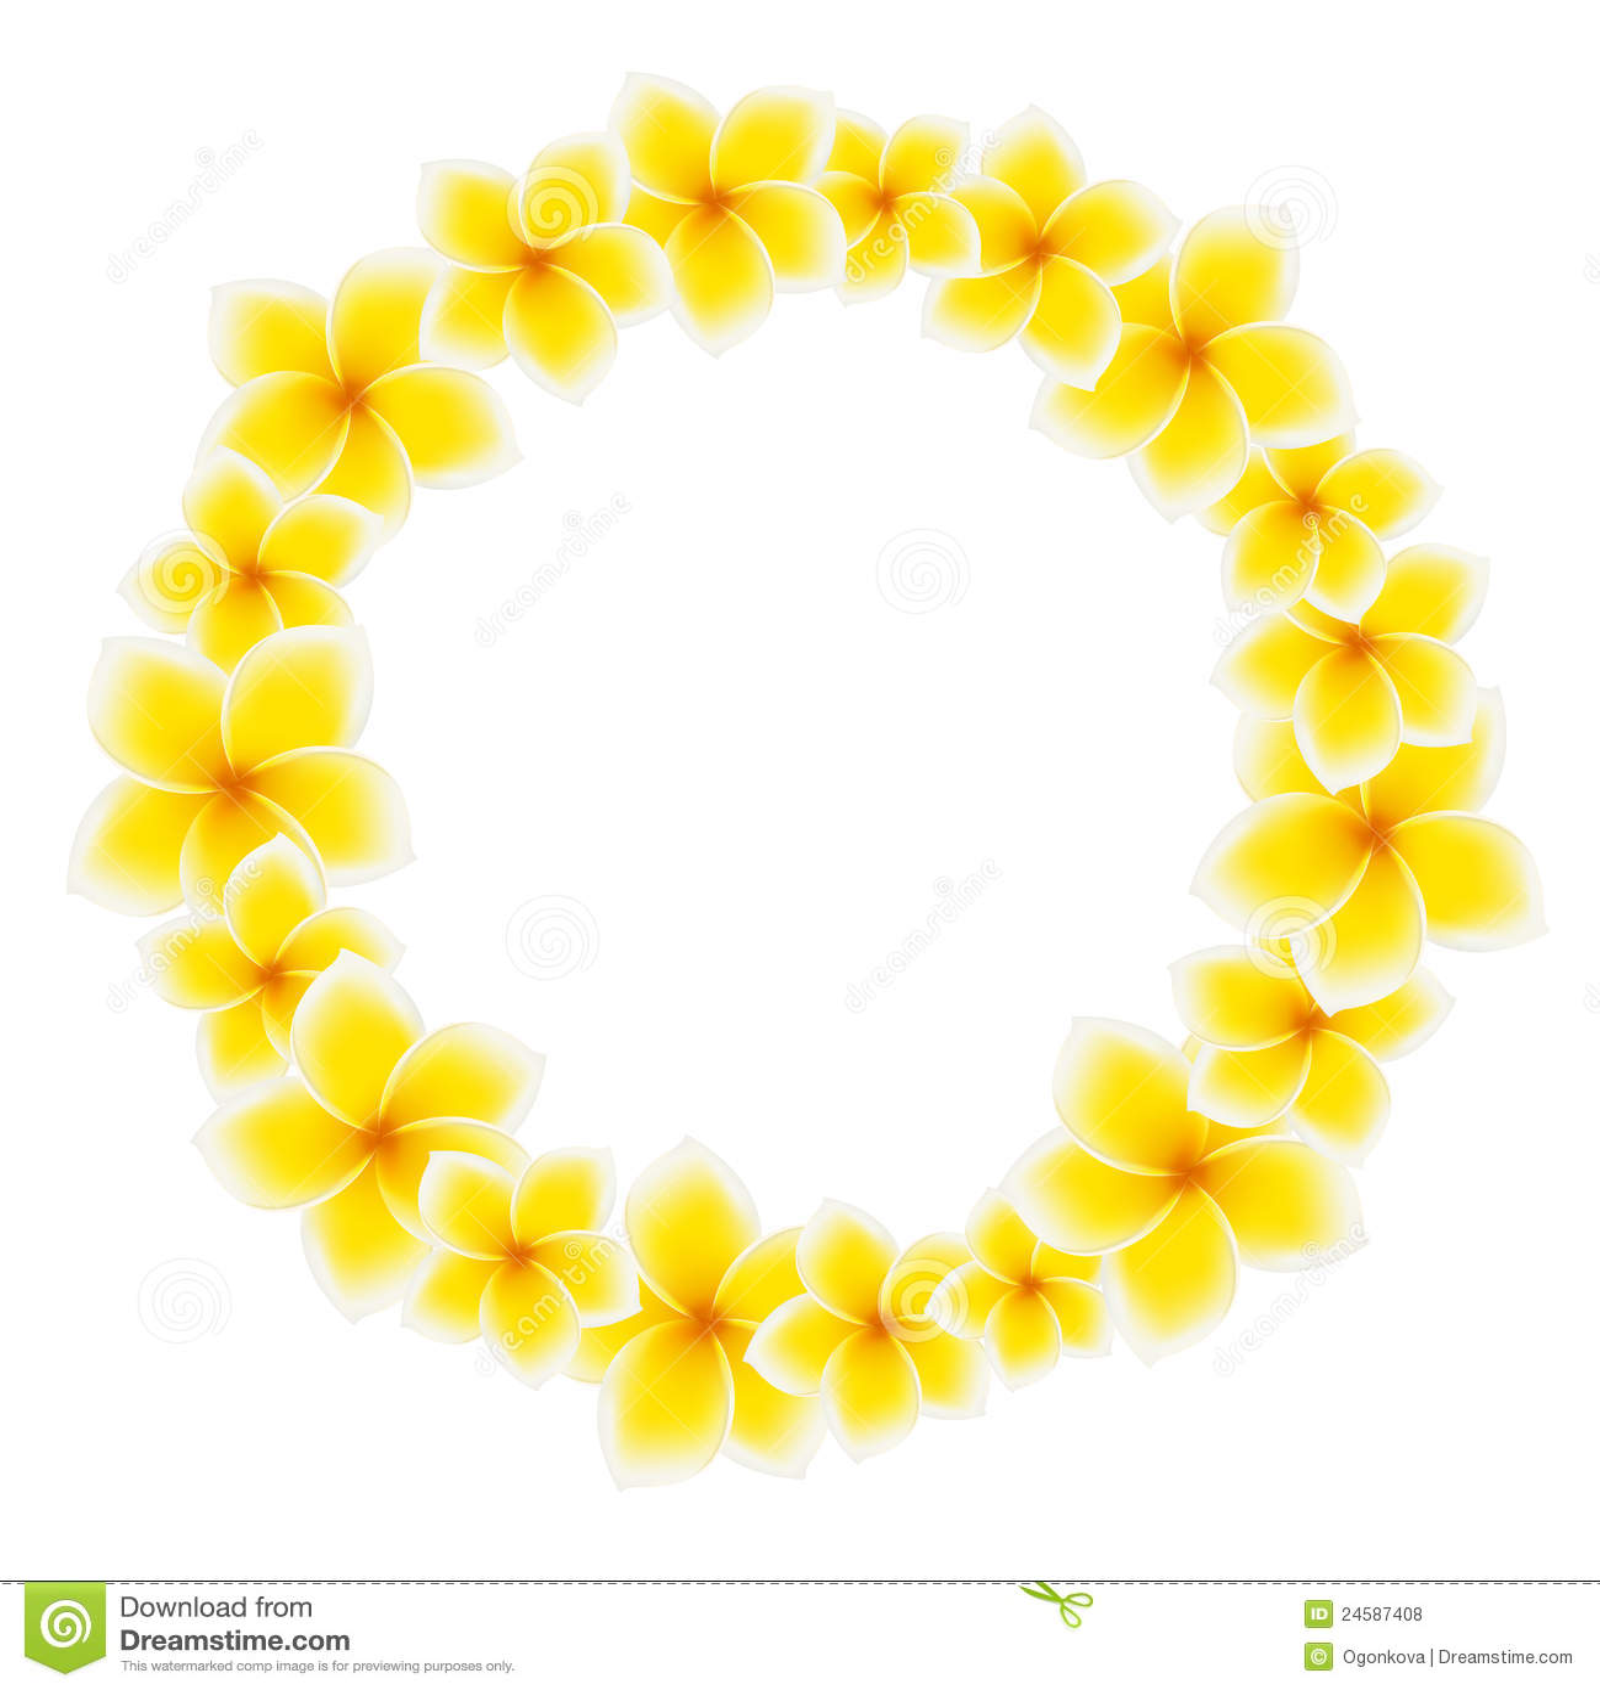 Circle Of Frangipani Flowers Royalty Free Stock Photos